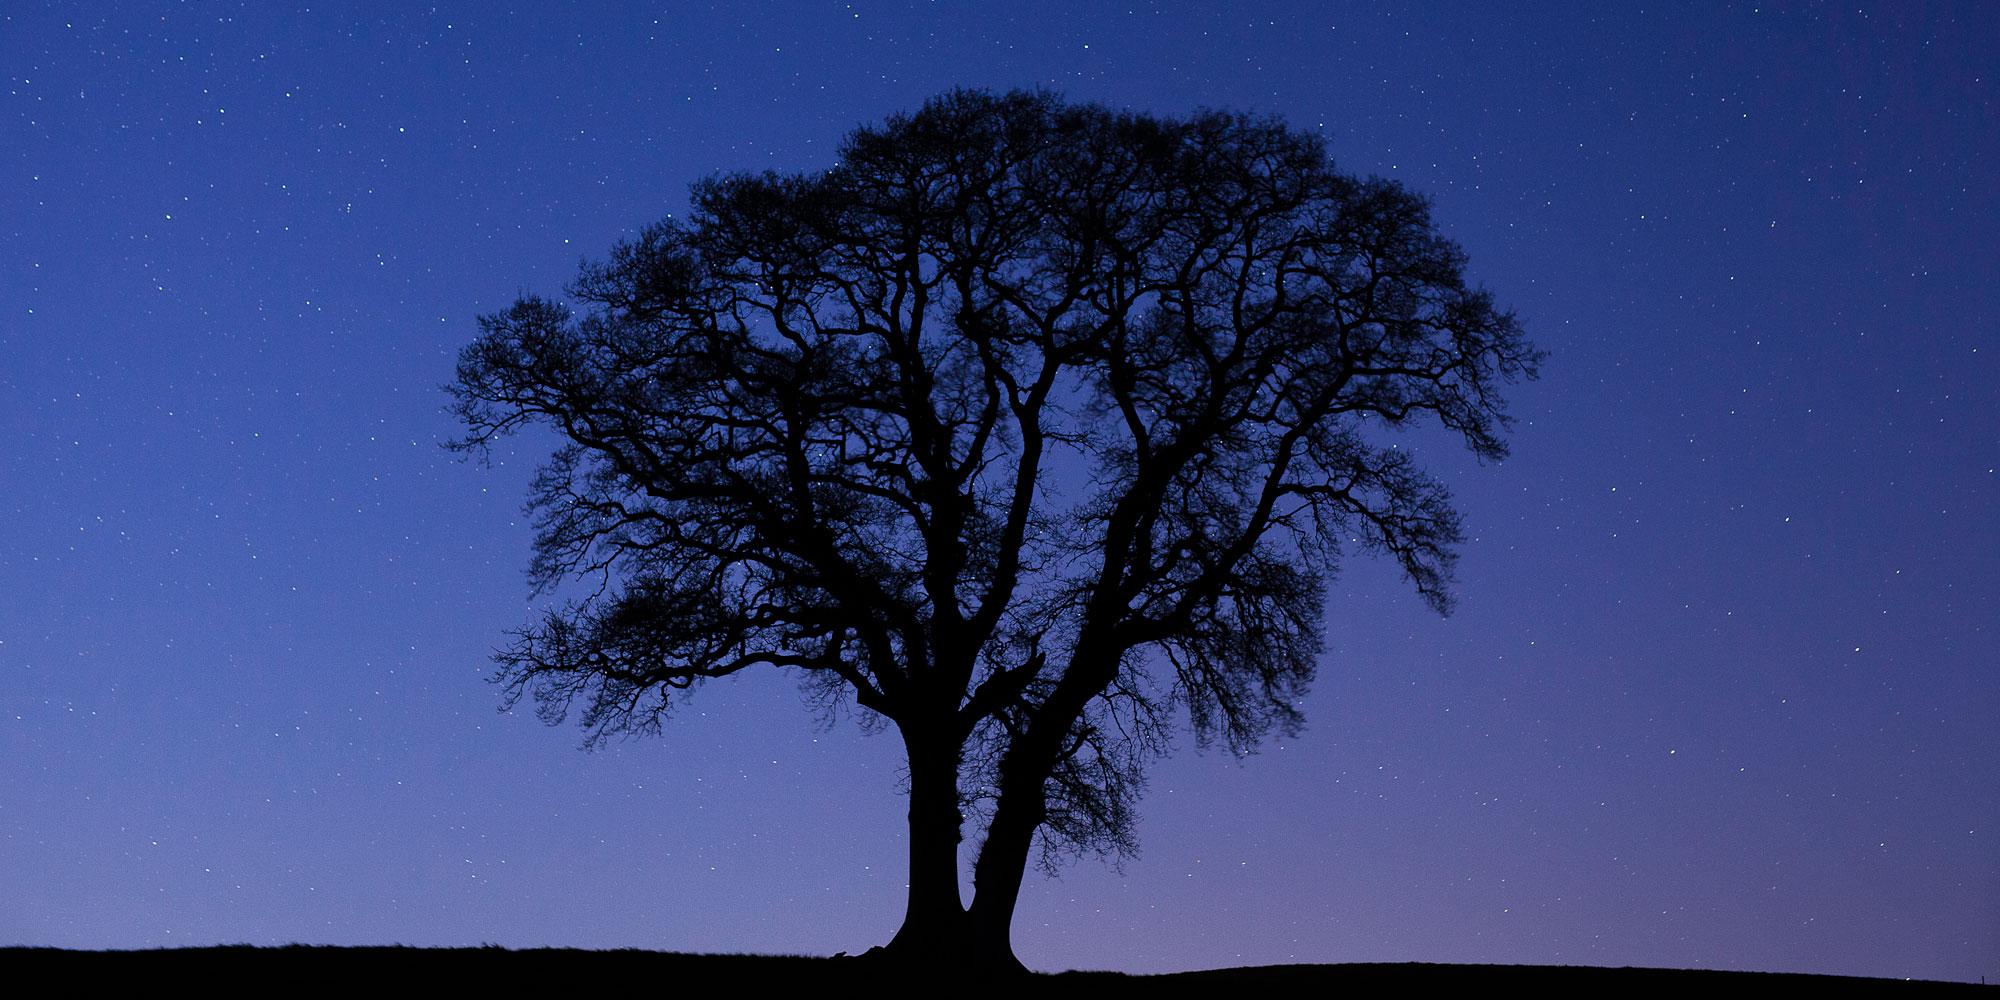 Oak silhouette and stars